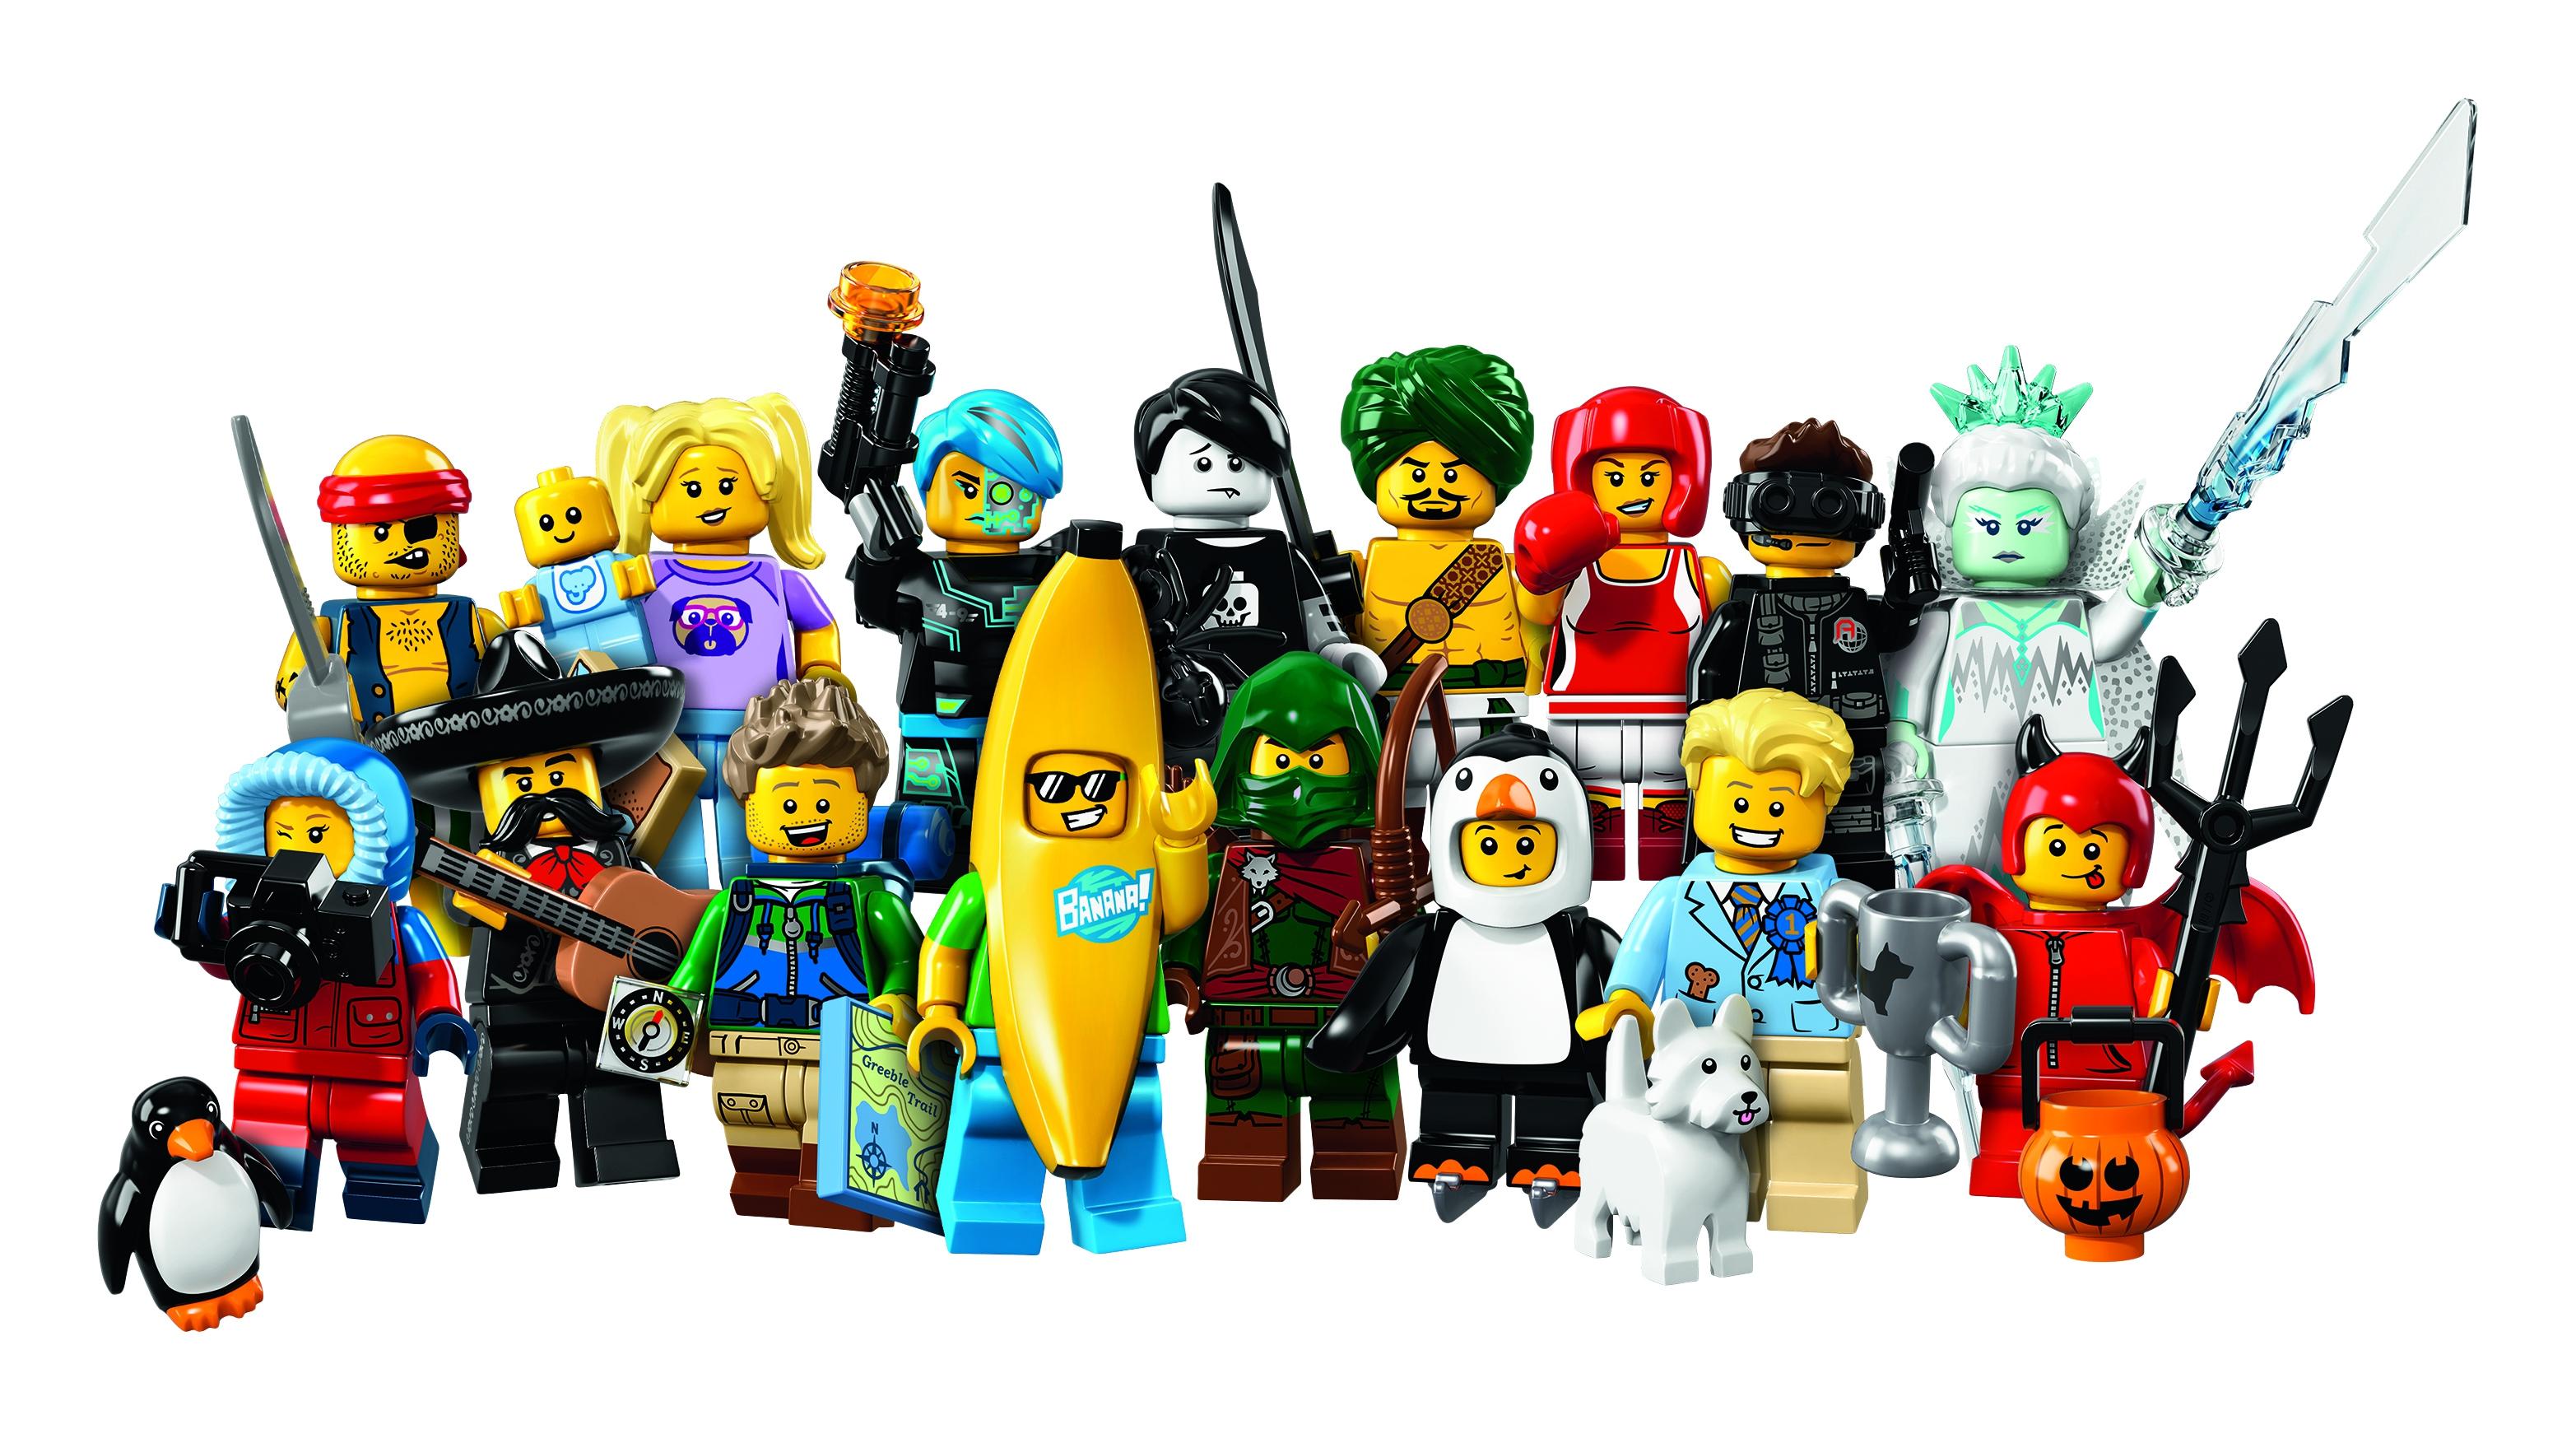 LEGO LEGO Minifigures 71013 Серия 16 детское лего decool 701 706 z minifigures vegeta yamcha minifigures 701 706